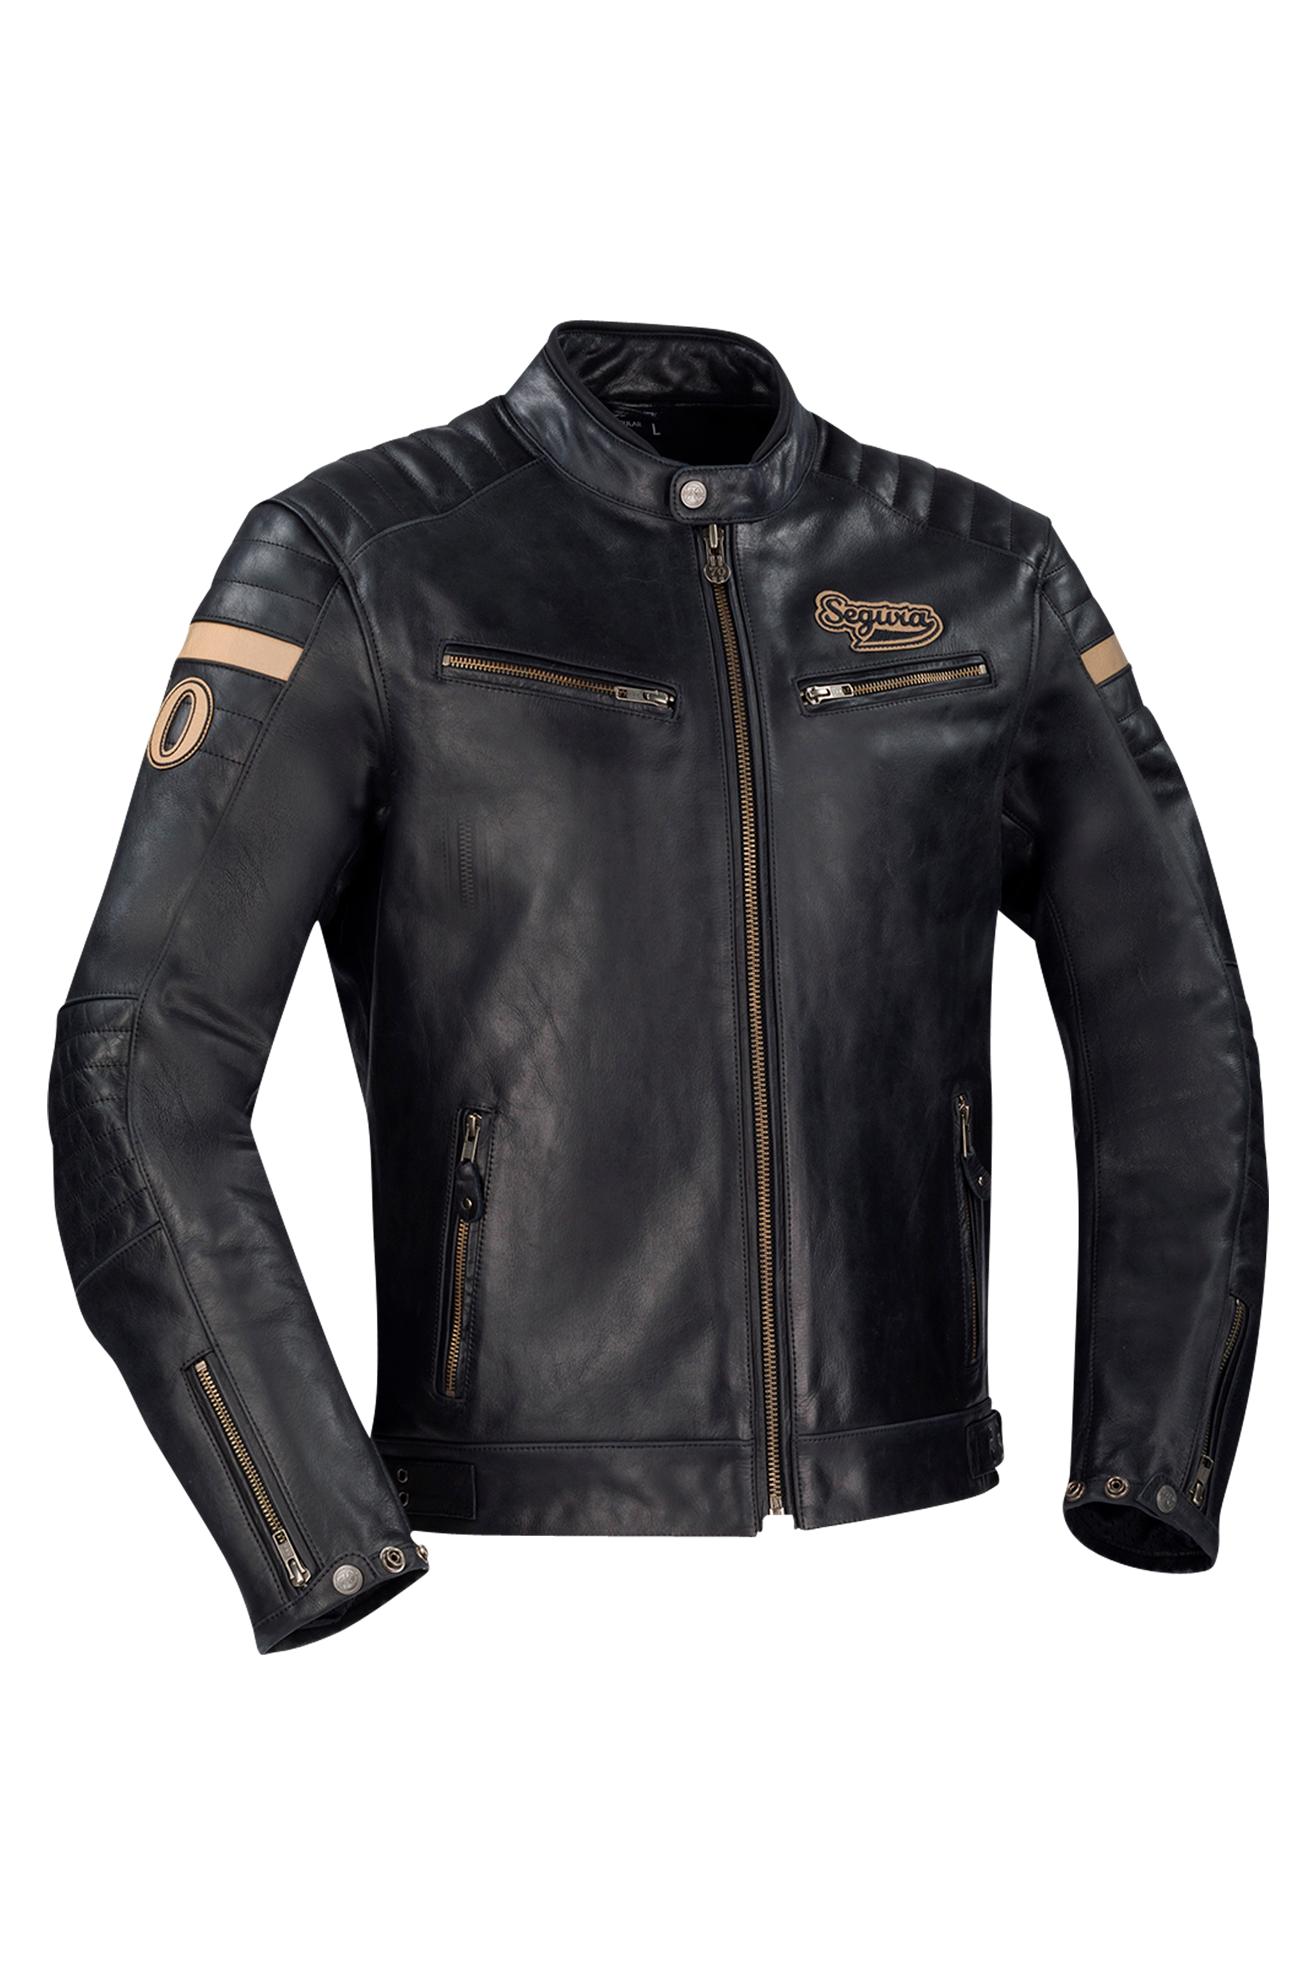 segura giacca moto  mortymer nera